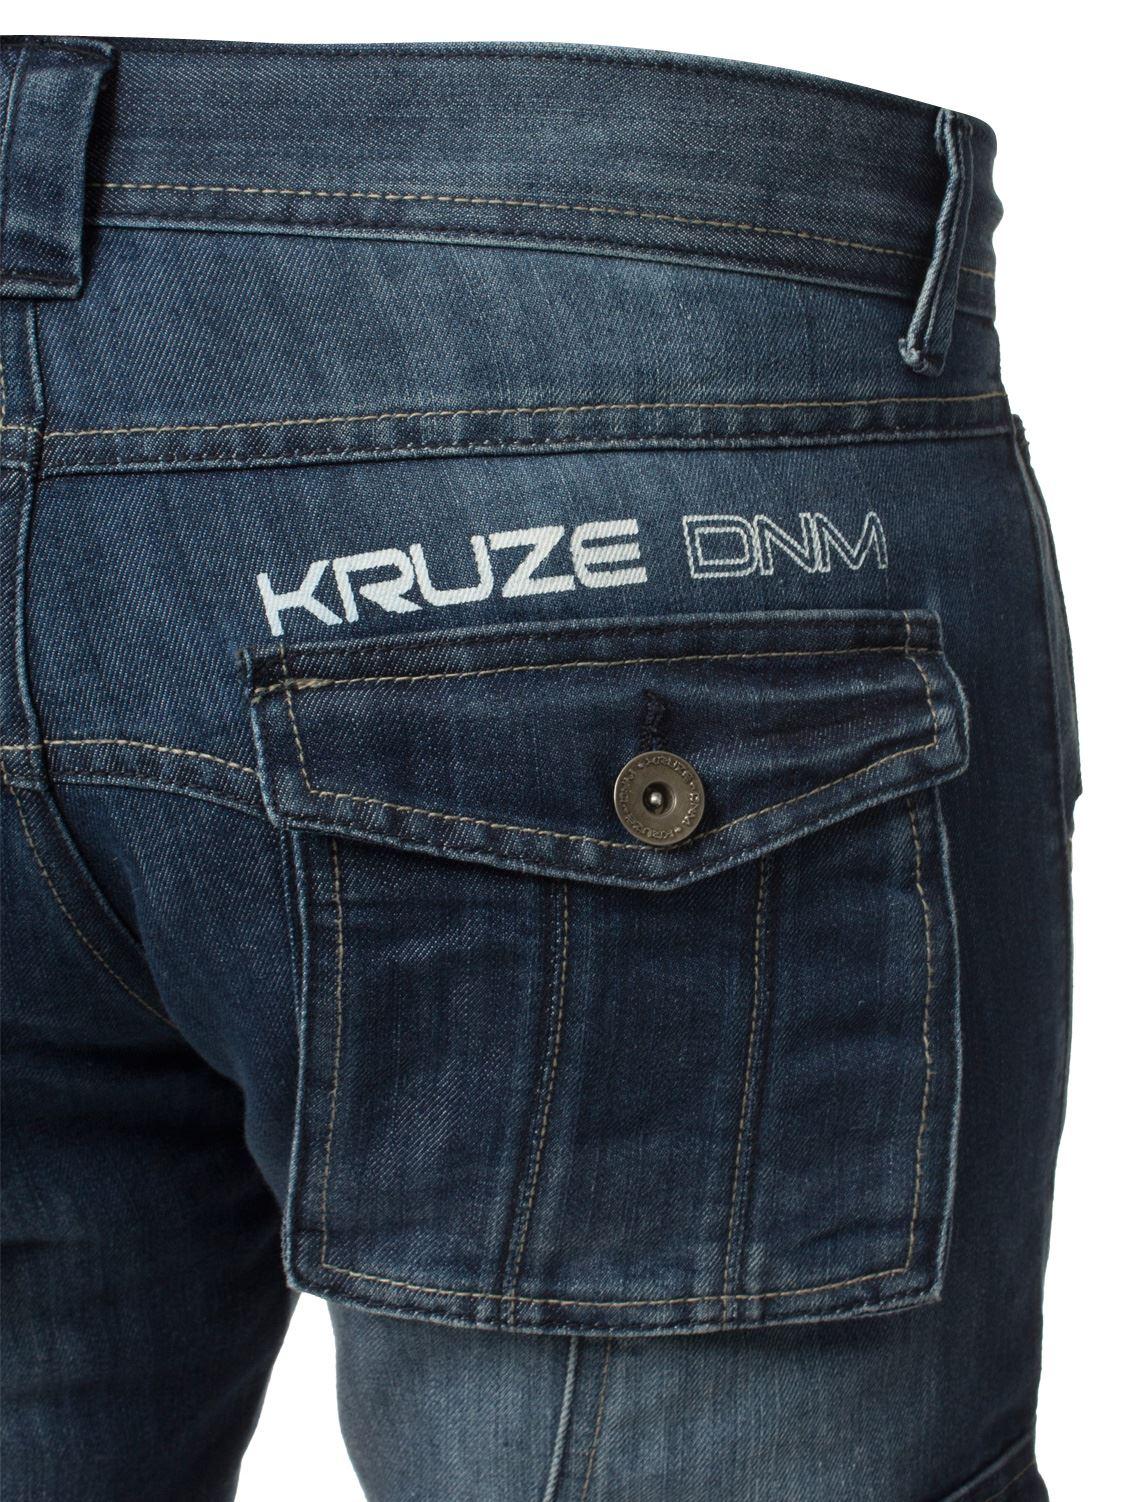 Mens-Jeans-Combate-Carga-Informal-Kruze-Trabajo-Pantalones-Cintura-Tallas-Denim-Pantalones-de-vestir miniatura 16